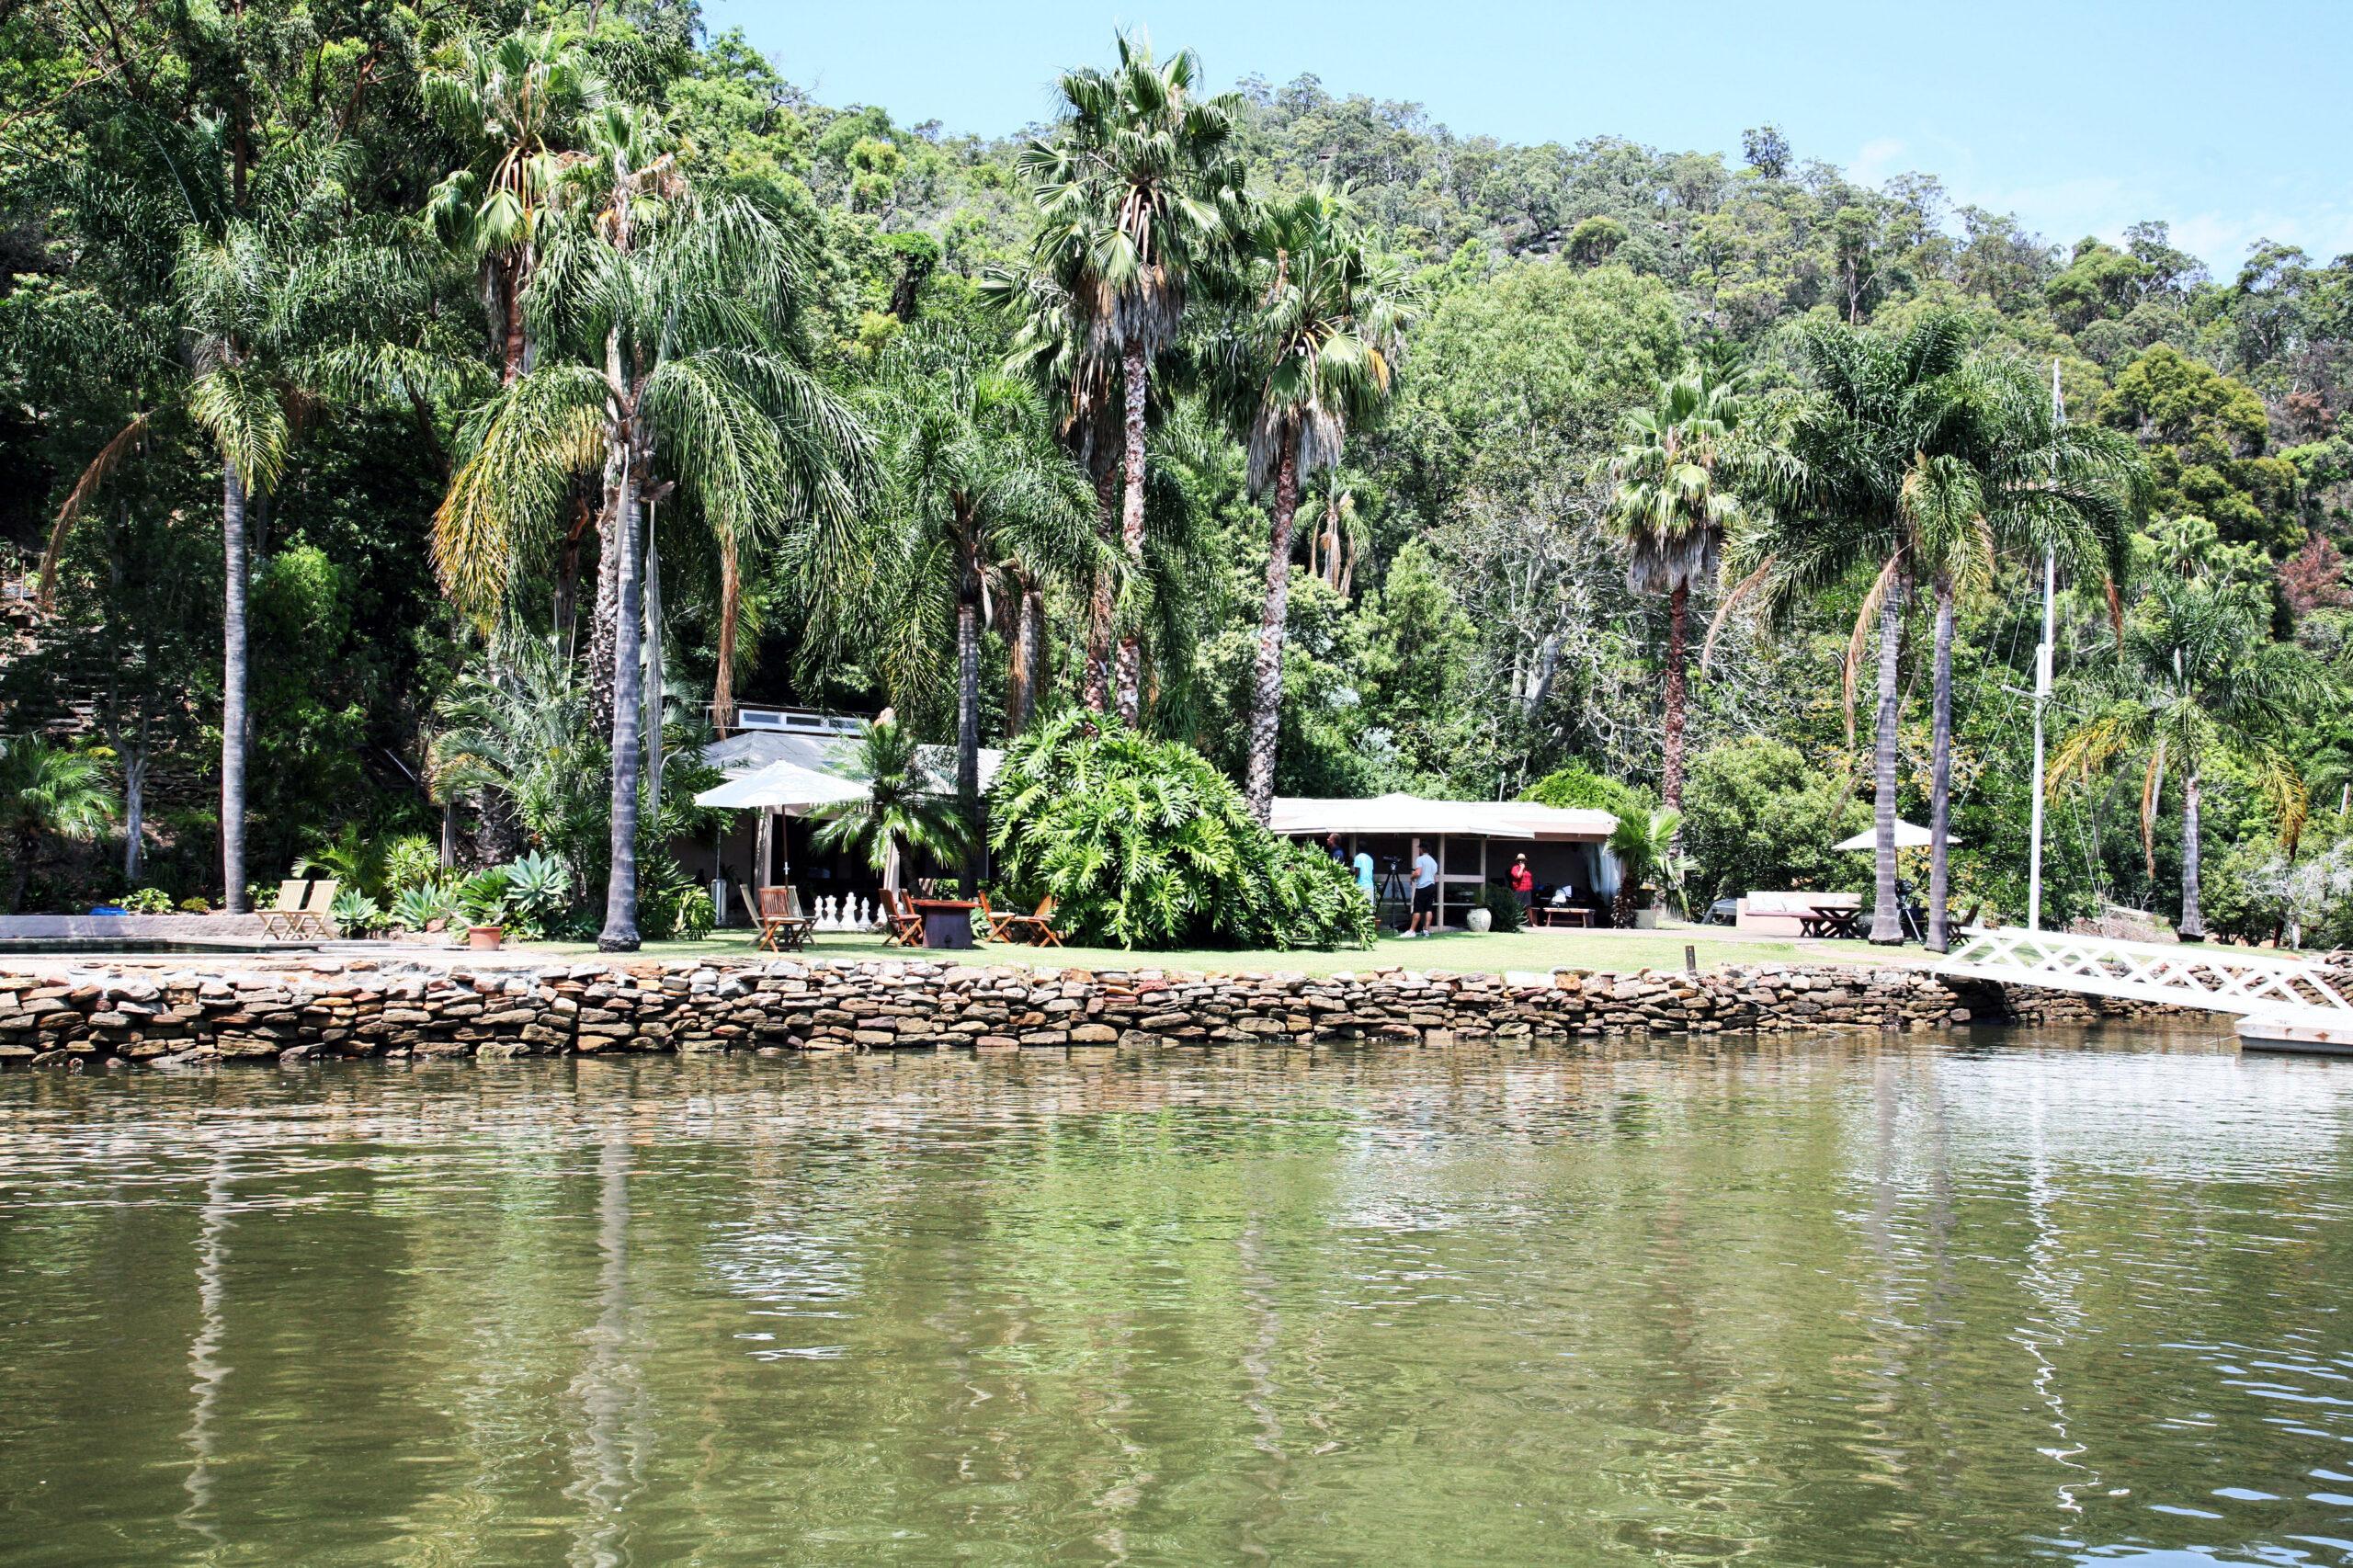 YOTSPACE superyacht voyages - Sydney expeditions - Corroboree